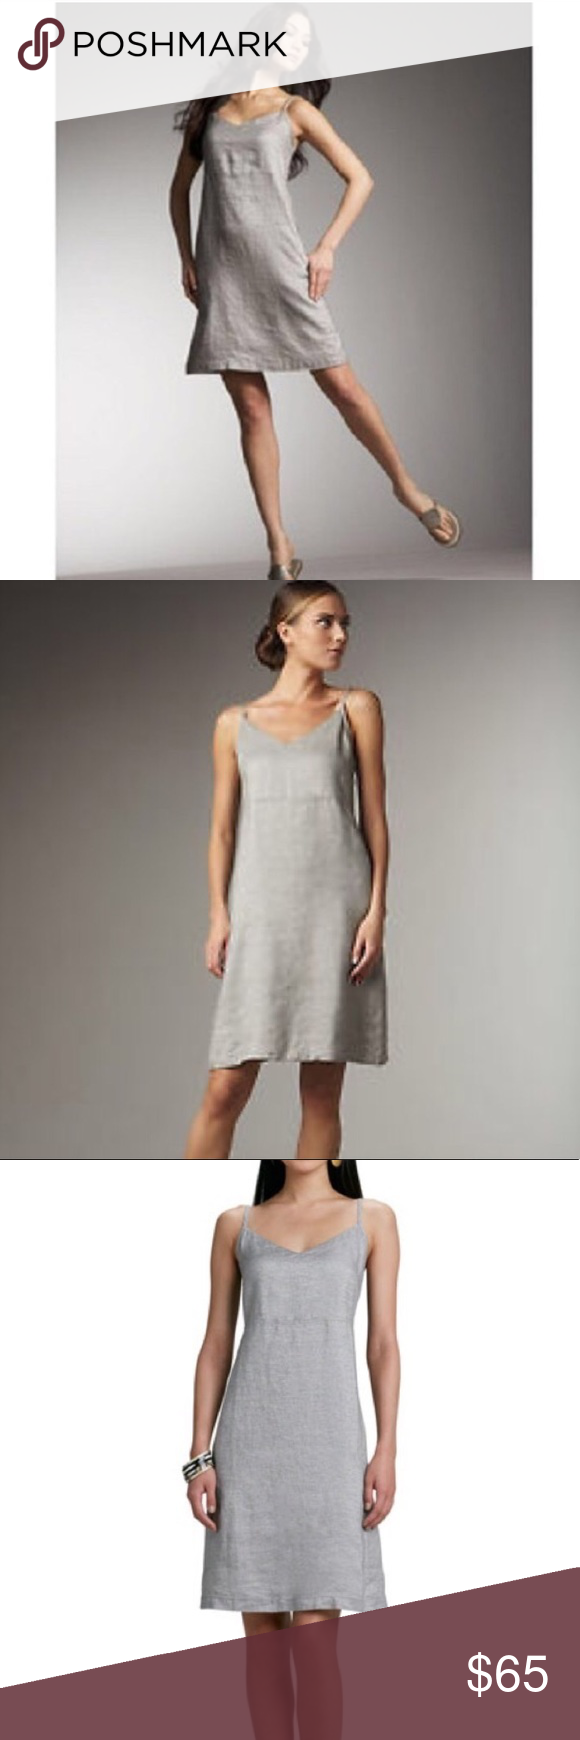 a5725854e5c Eileen Fisher twinkle linen slip dress Silver metallic linen shift ...